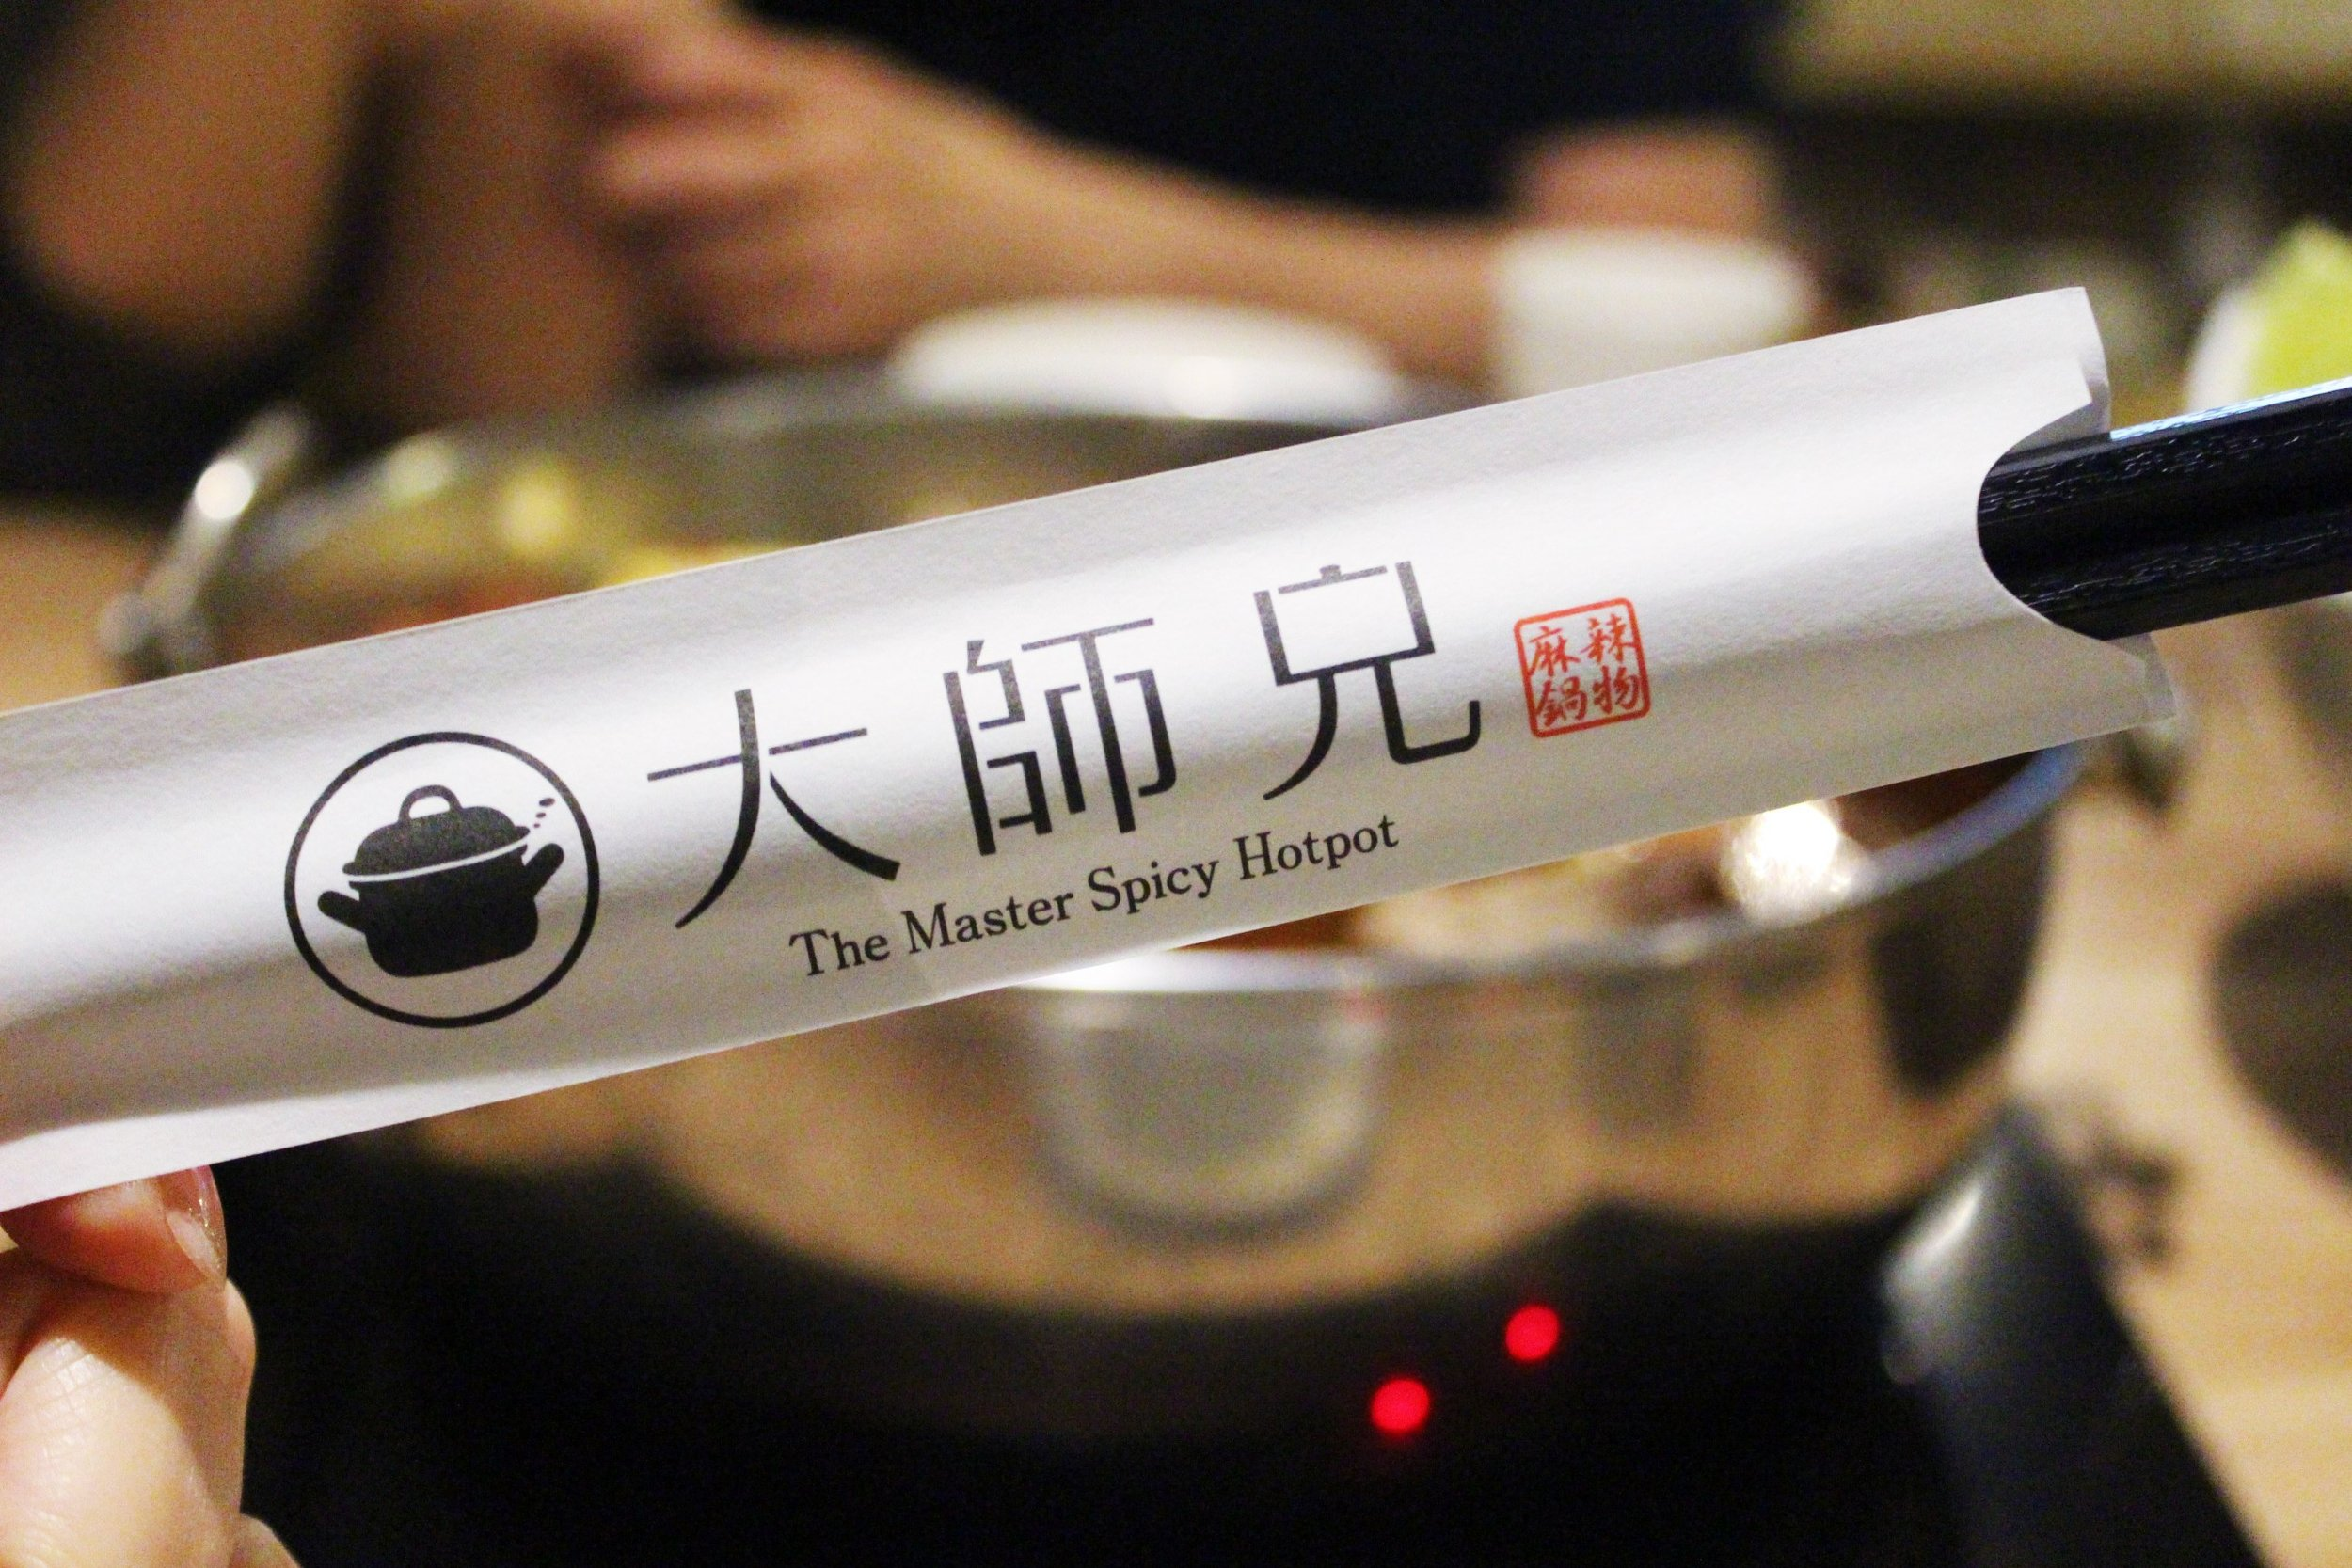 The Master Spicy Hotpot 大師兄麻辣鍋物